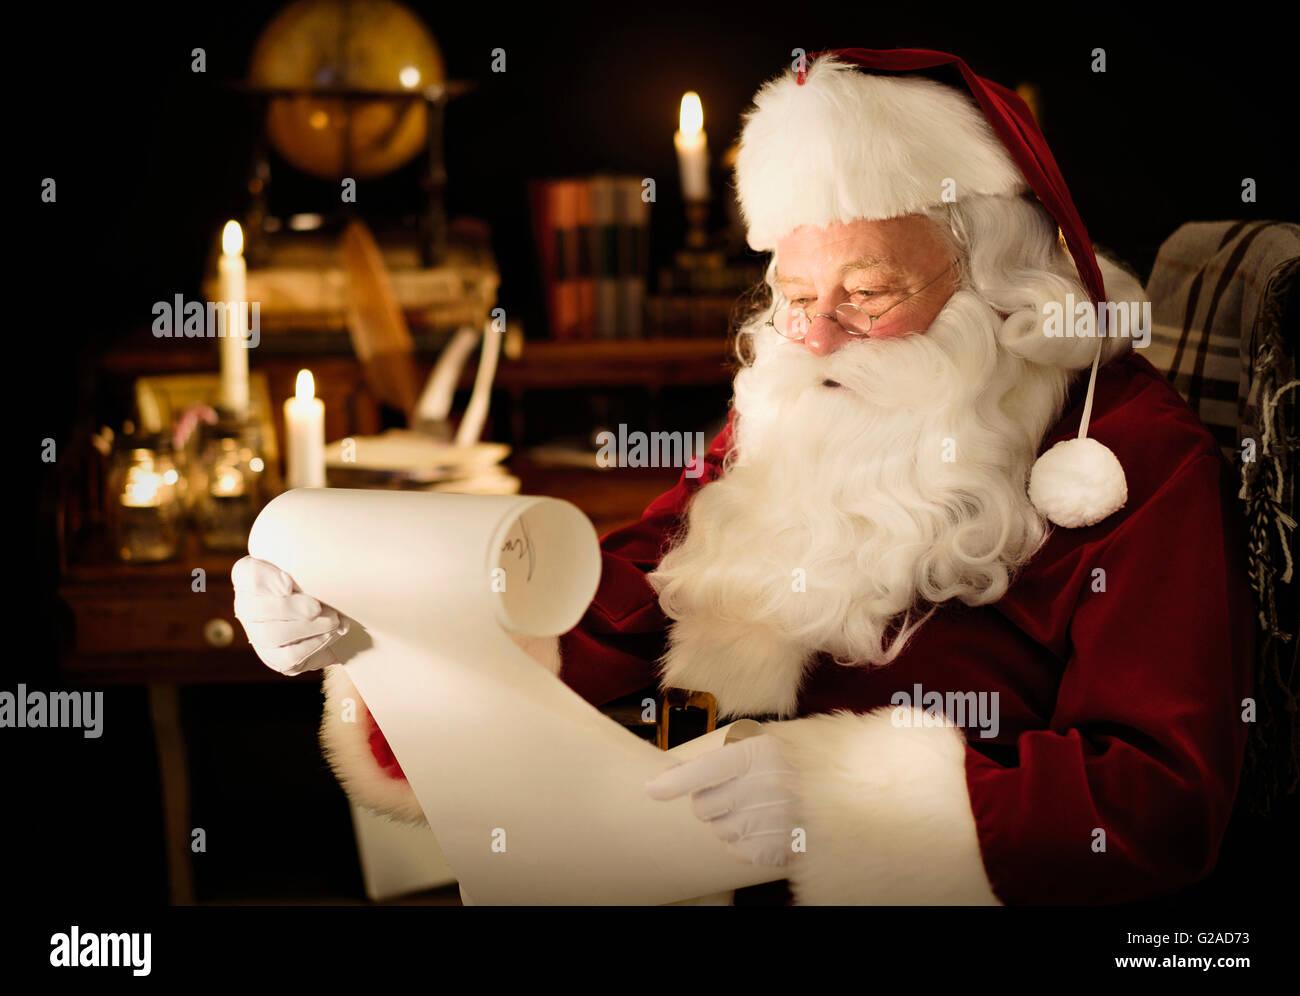 Portrait of Santa Claus reading child's letter - Stock Image